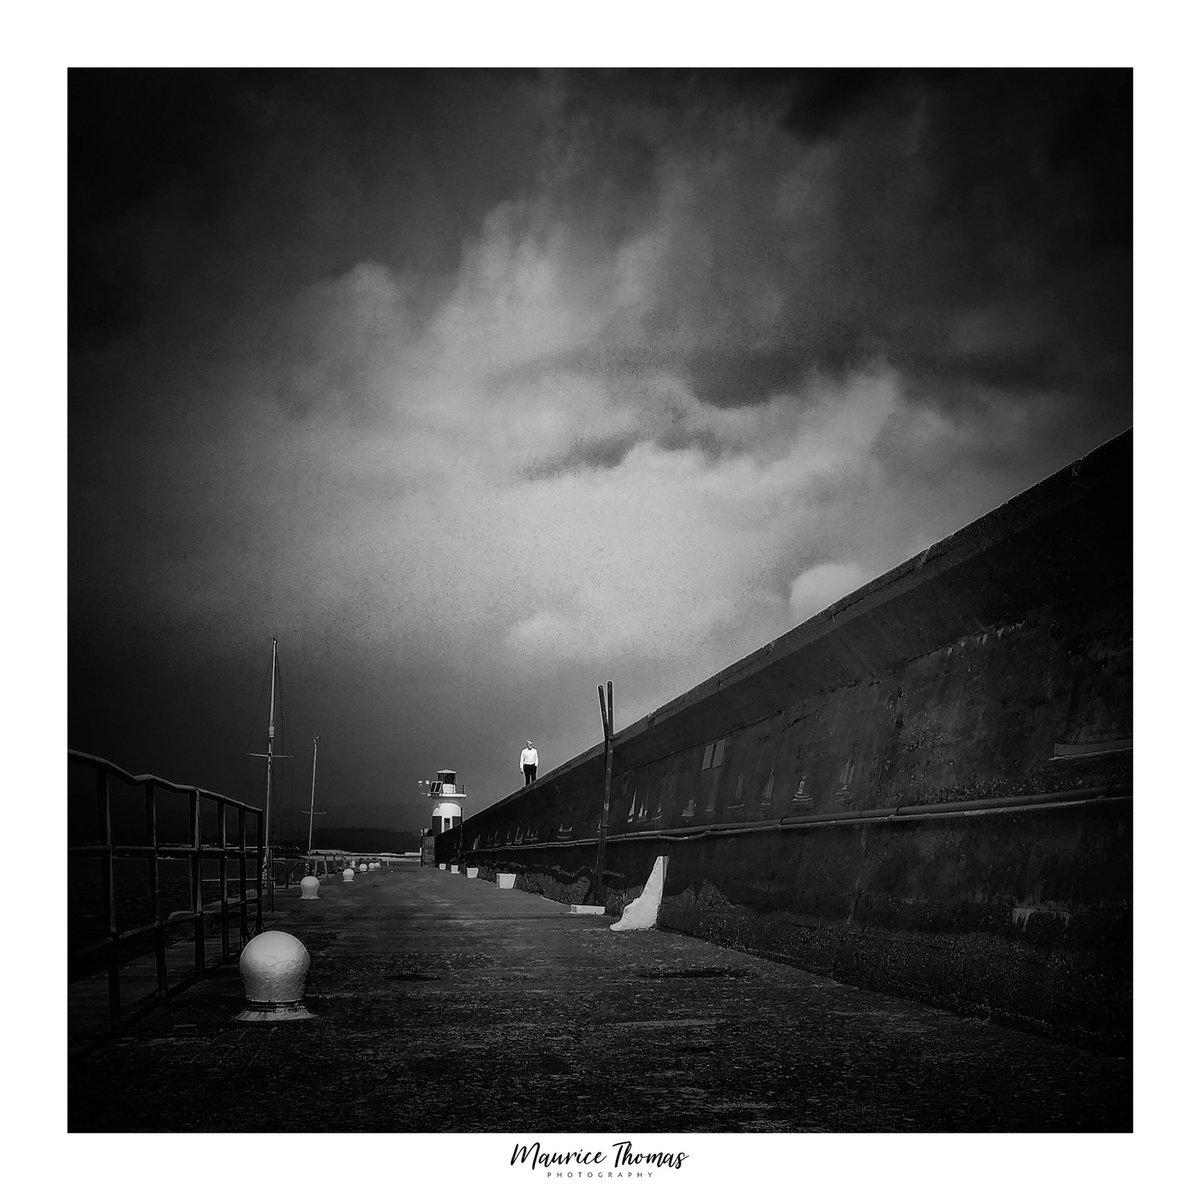 Wicklow Lighthouse, Ireland  #coastalireland #wicklowtownteam #coastalphotography #picoftheday #irishlandscape #stormhour #irishlandscapephotography #landscapephotography #irelandsancienteast #wicklowoutdoors #irishphotos #irishcoasts #travelireland #irelanddaily #mywicklowpic.twitter.com/rf8r4PT0b9